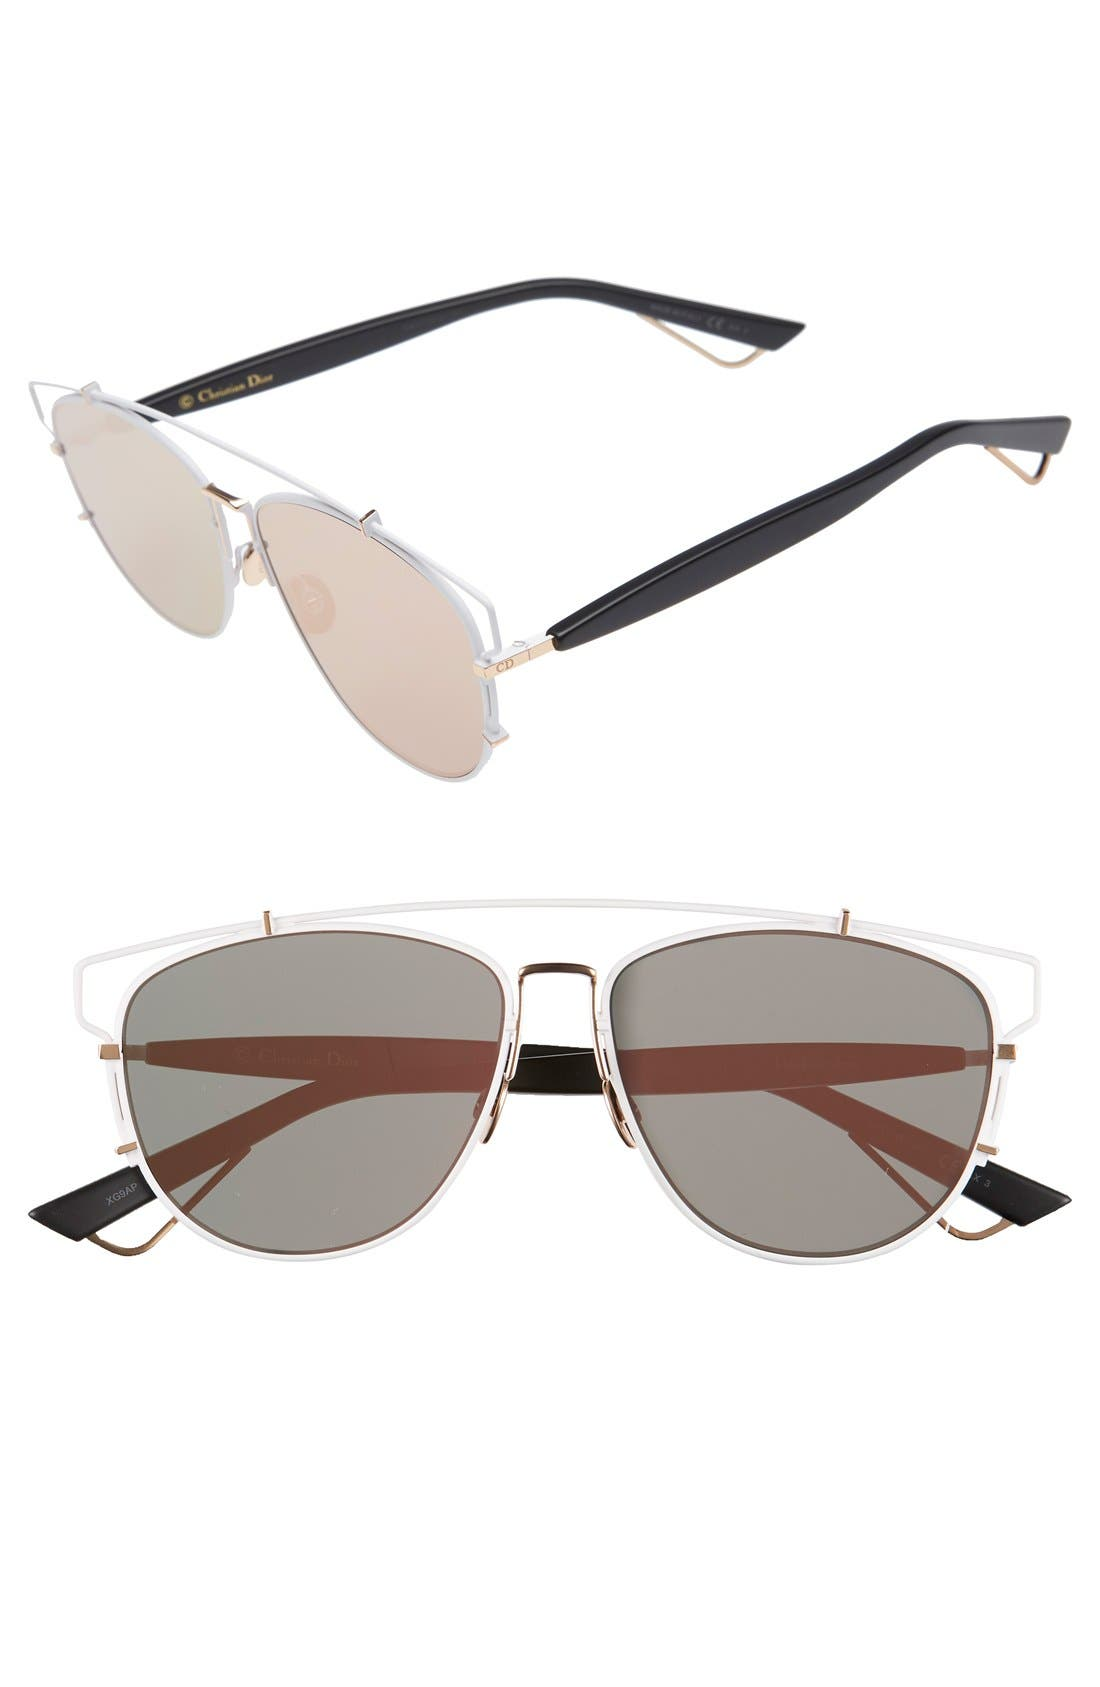 Technologic 57mm Brow Bar Sunglasses,                             Main thumbnail 7, color,